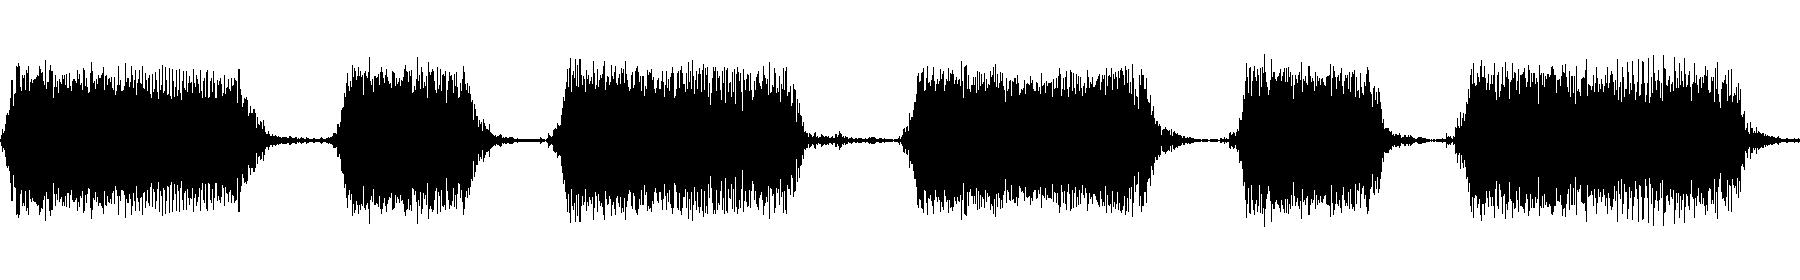 guitarrock01 100